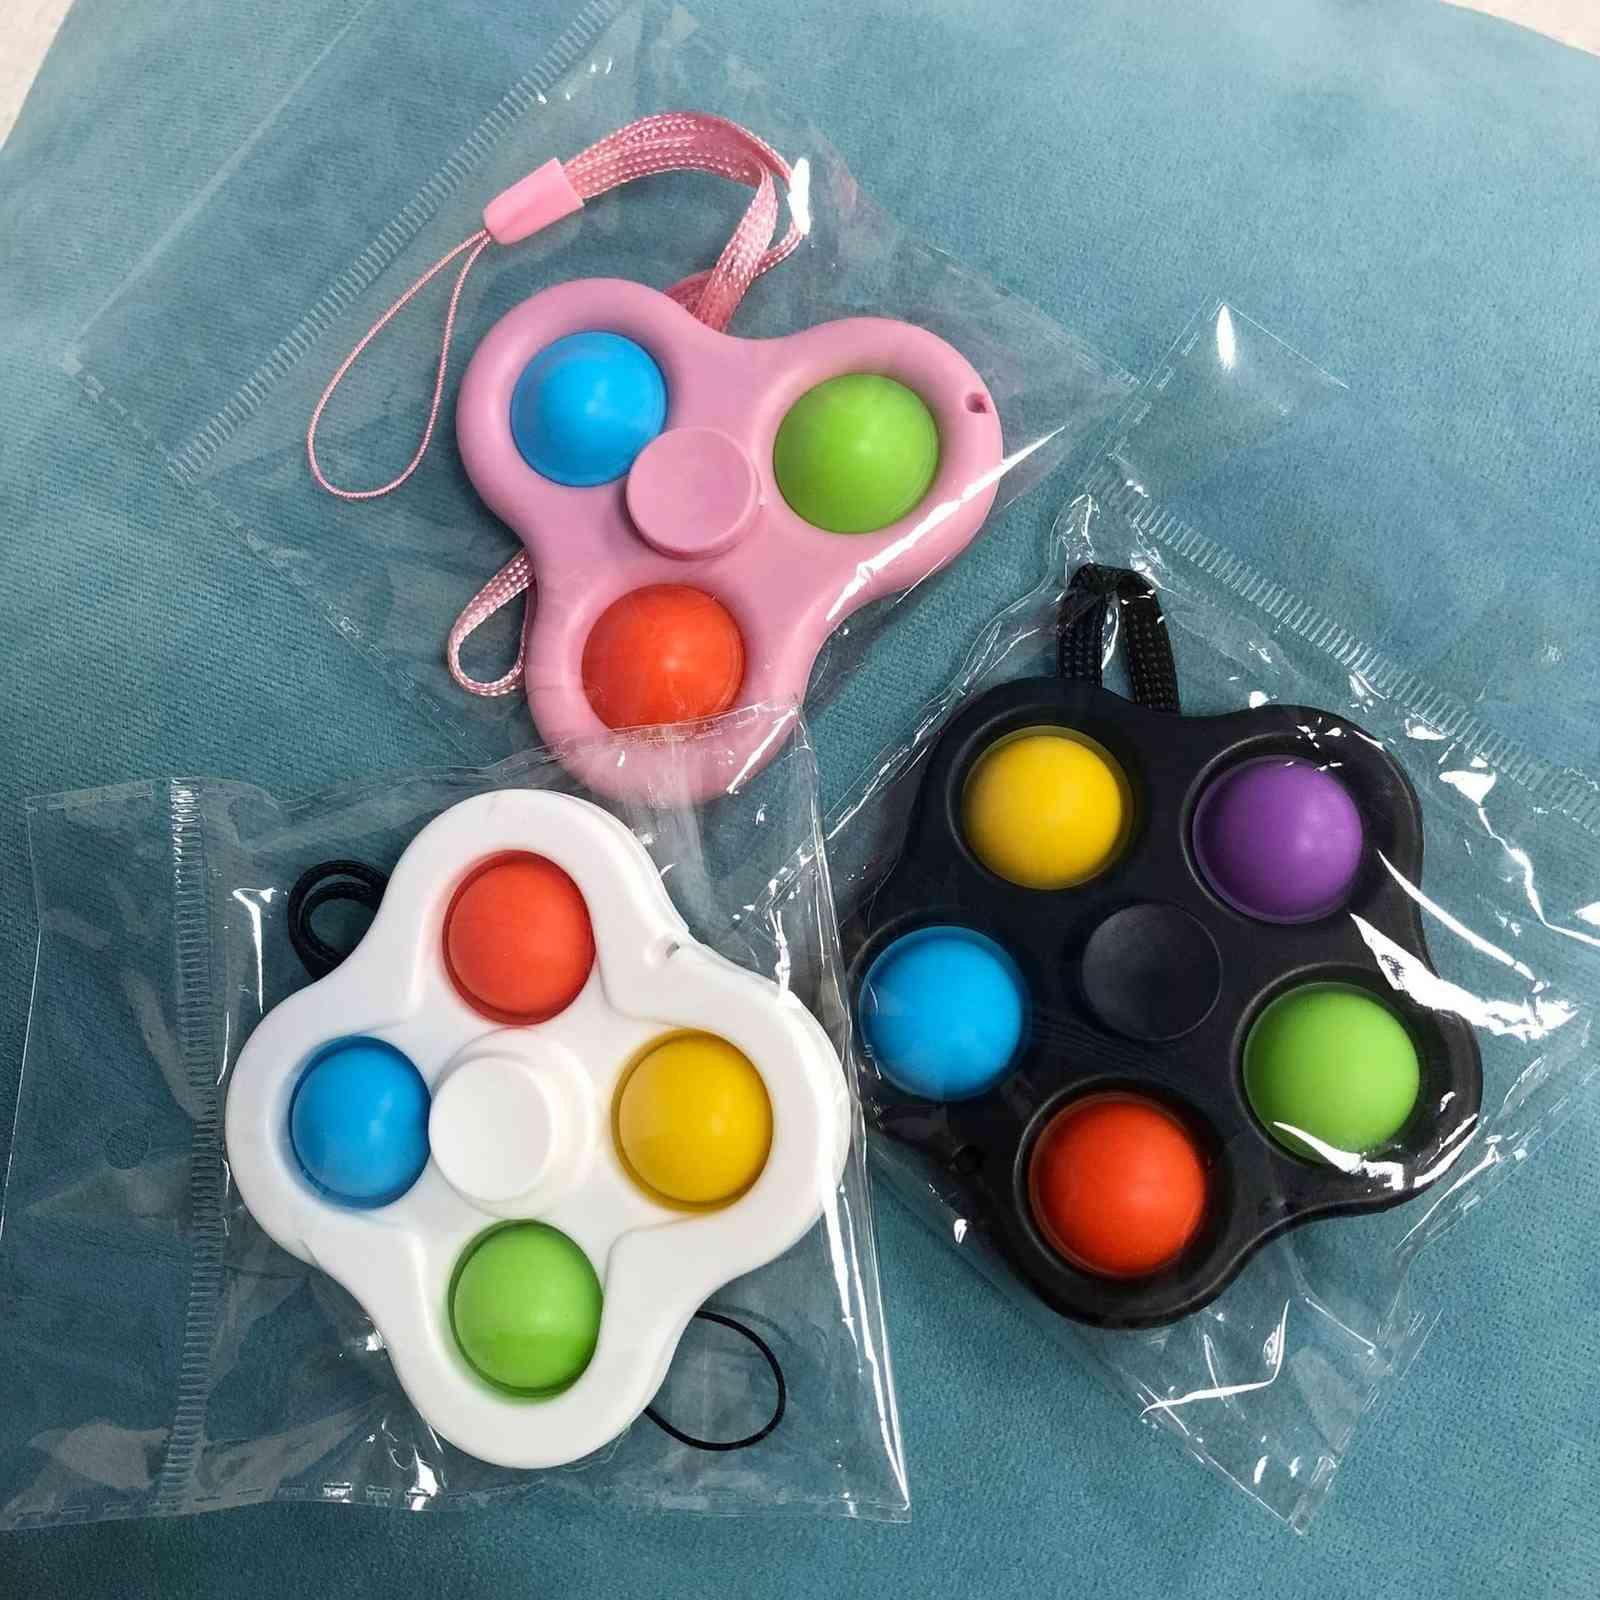 Com cordão Fidget Brinquedos Bubble Poppers Chave Anel Push Spinner Board Stress Relevo Decompression Finger Bubbles Squishies DNA Stress Ball Fidgets G47W6PG